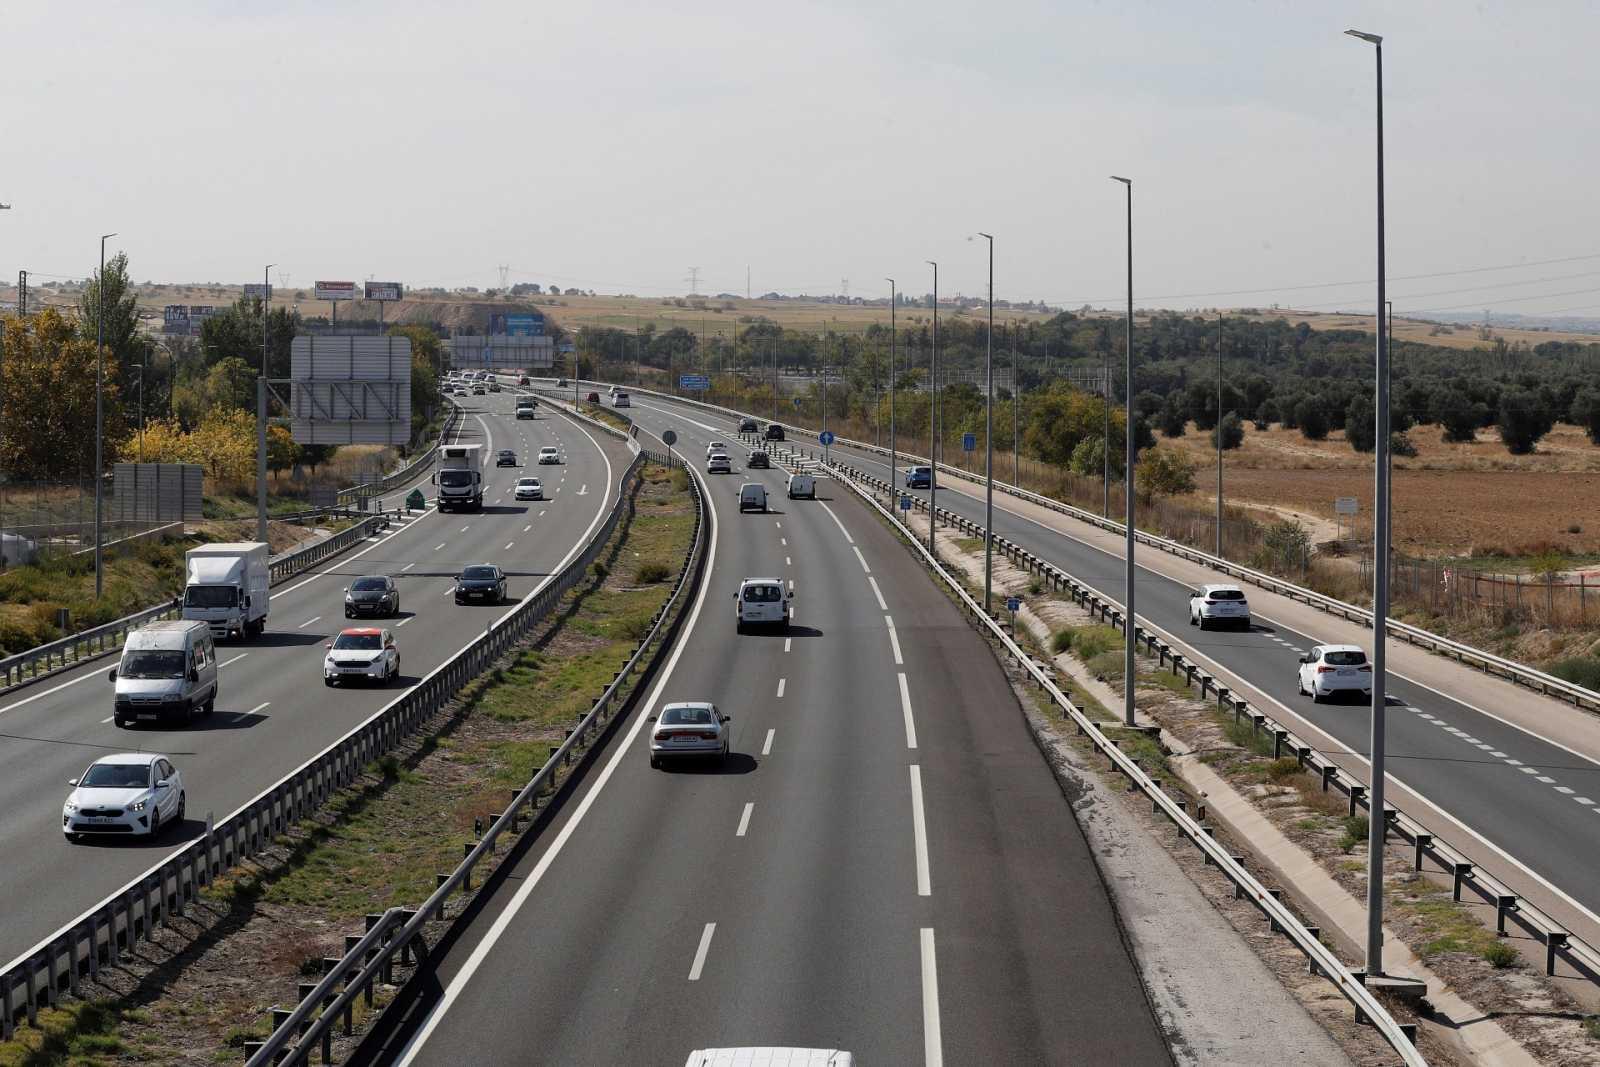 Carretera A-5 en sentido salida de Madrid.